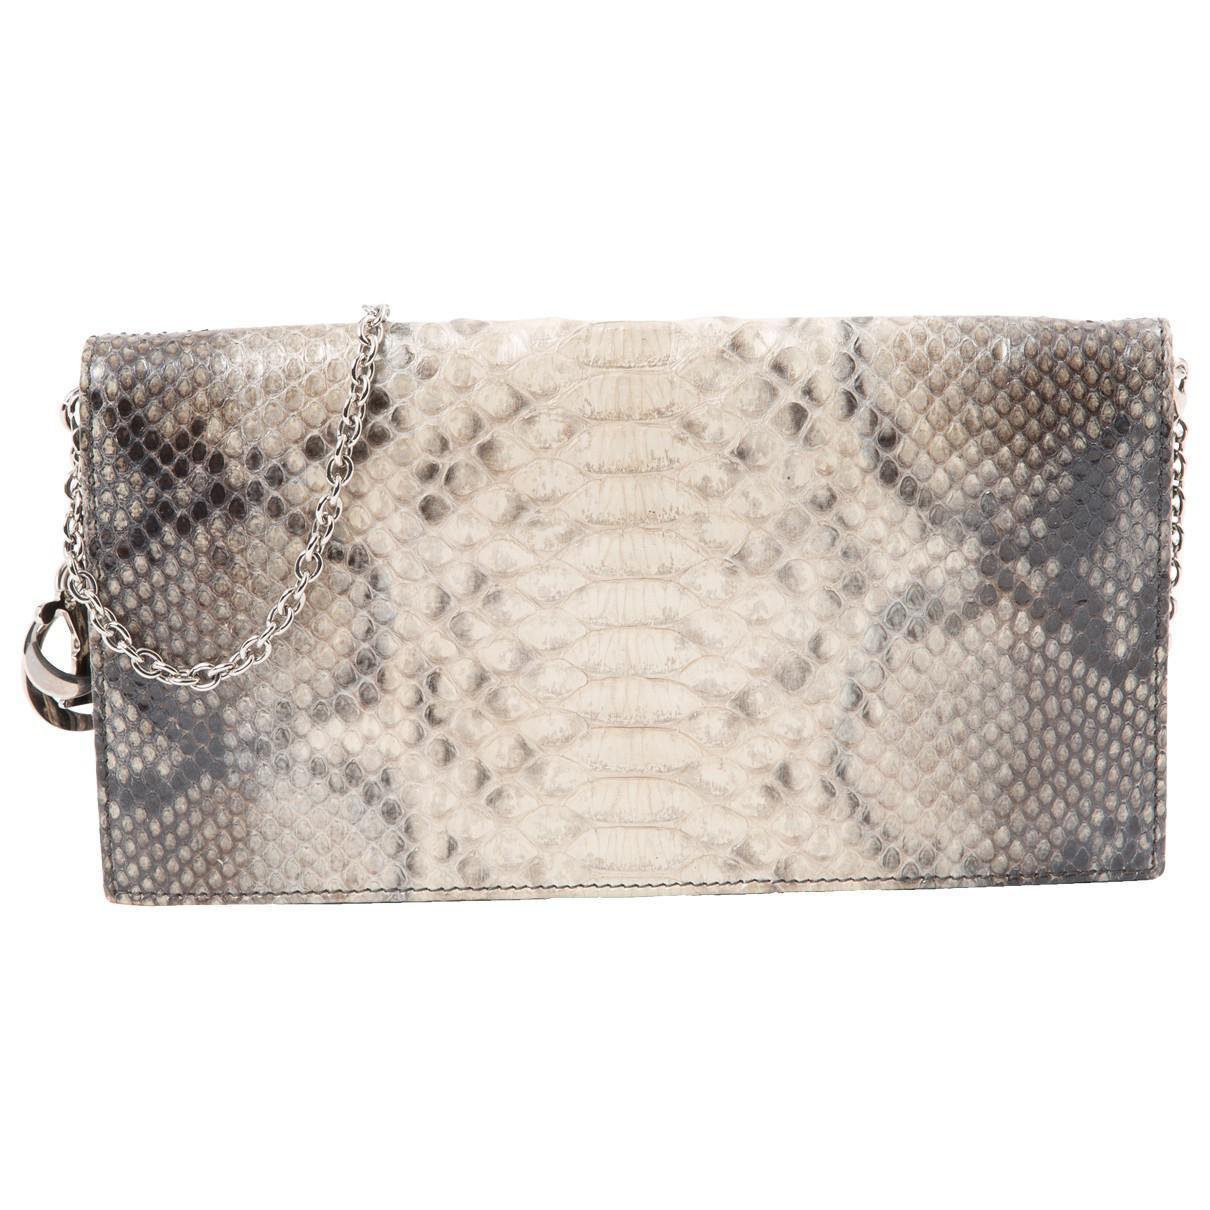 Pre-owned - Exotic leathers clutch bag Dior OT0MnuQ